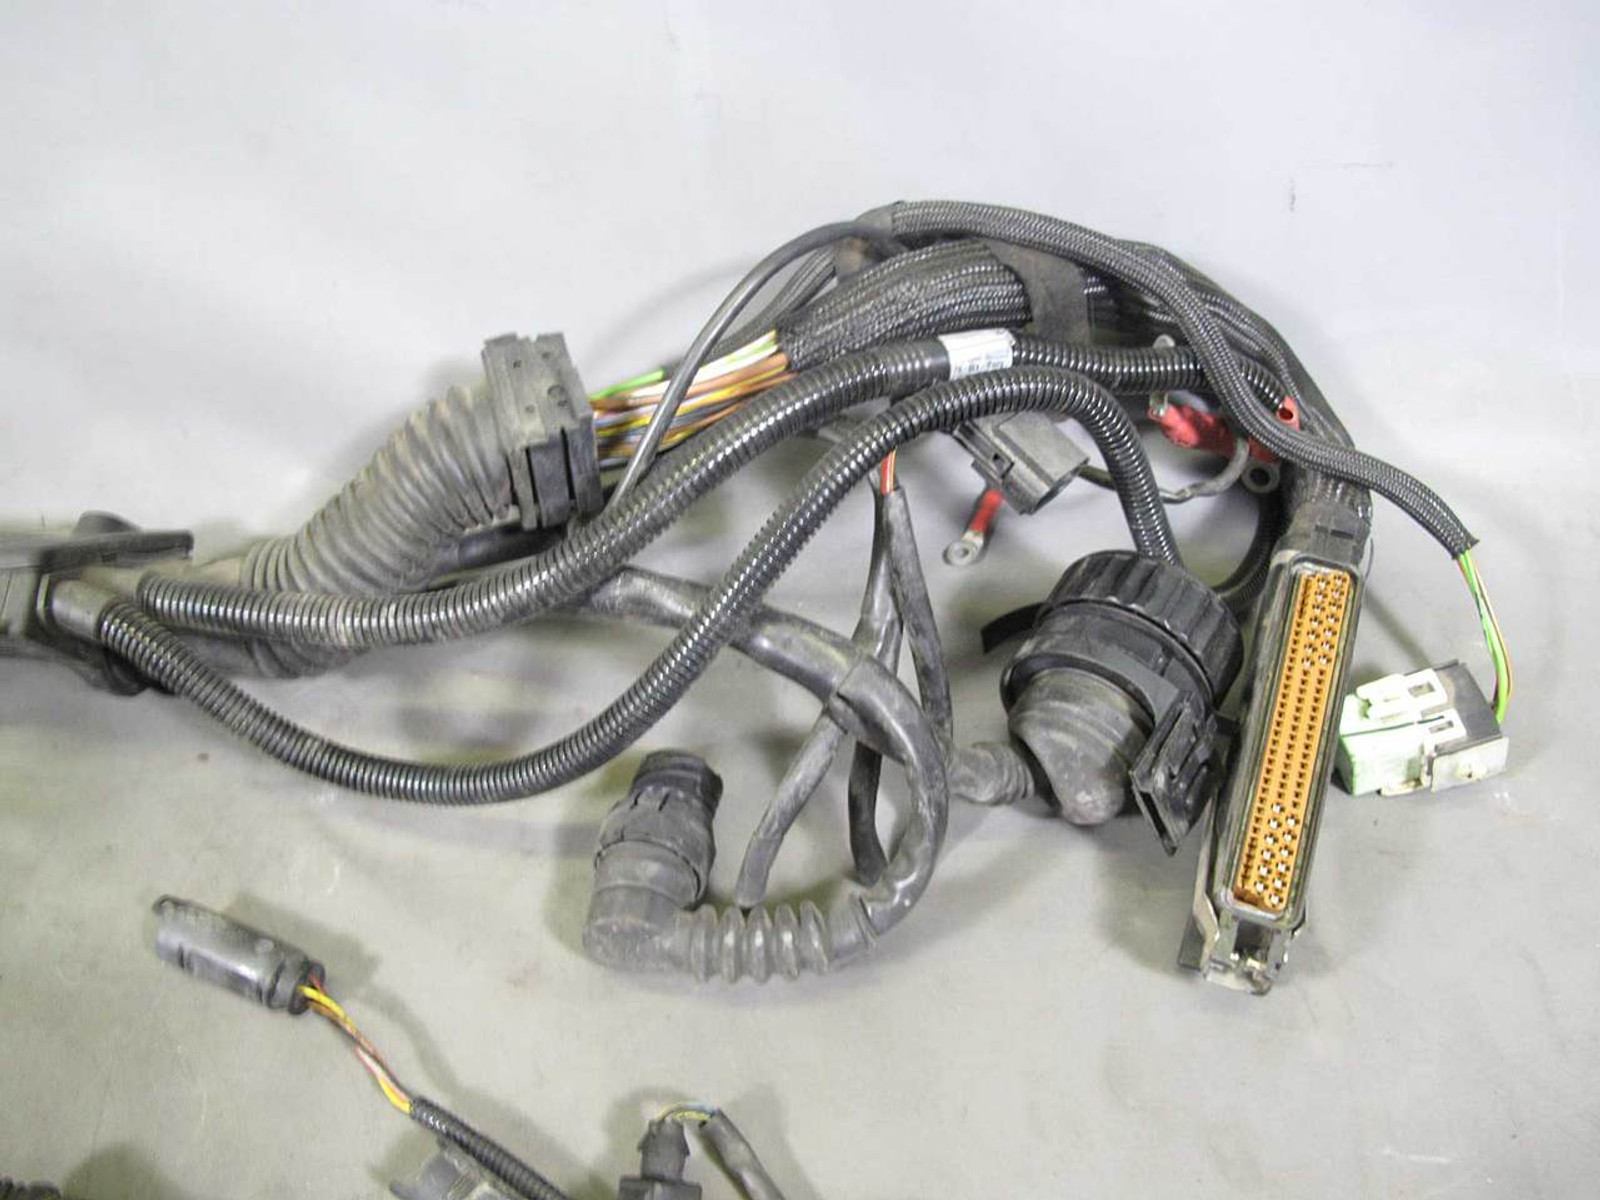 328i wiring harness example electrical wiring diagram u2022 rh huntervalleyhotels co 2002 BMW 325I Vacuum Diagrams 1996 BMW 328I Relay Diagram